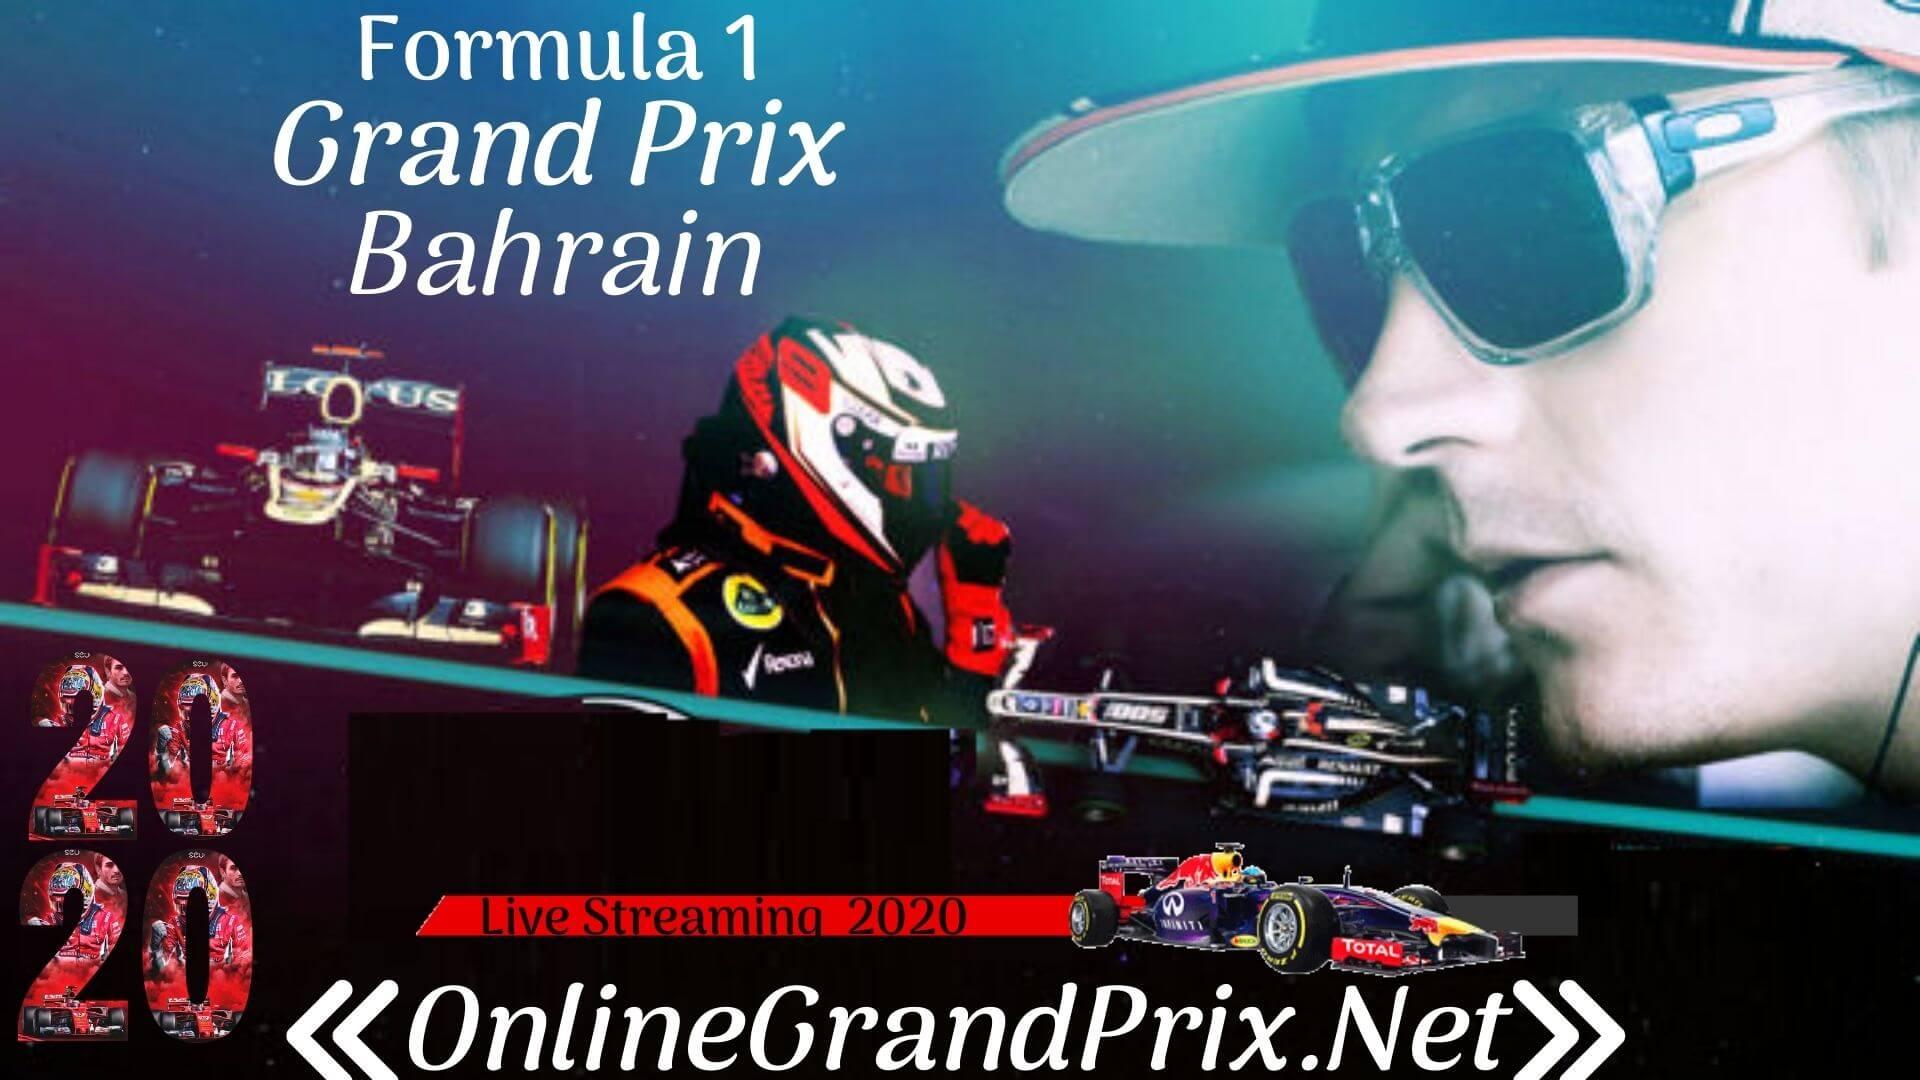 F1 Bahrain Grand Prix Live Stream